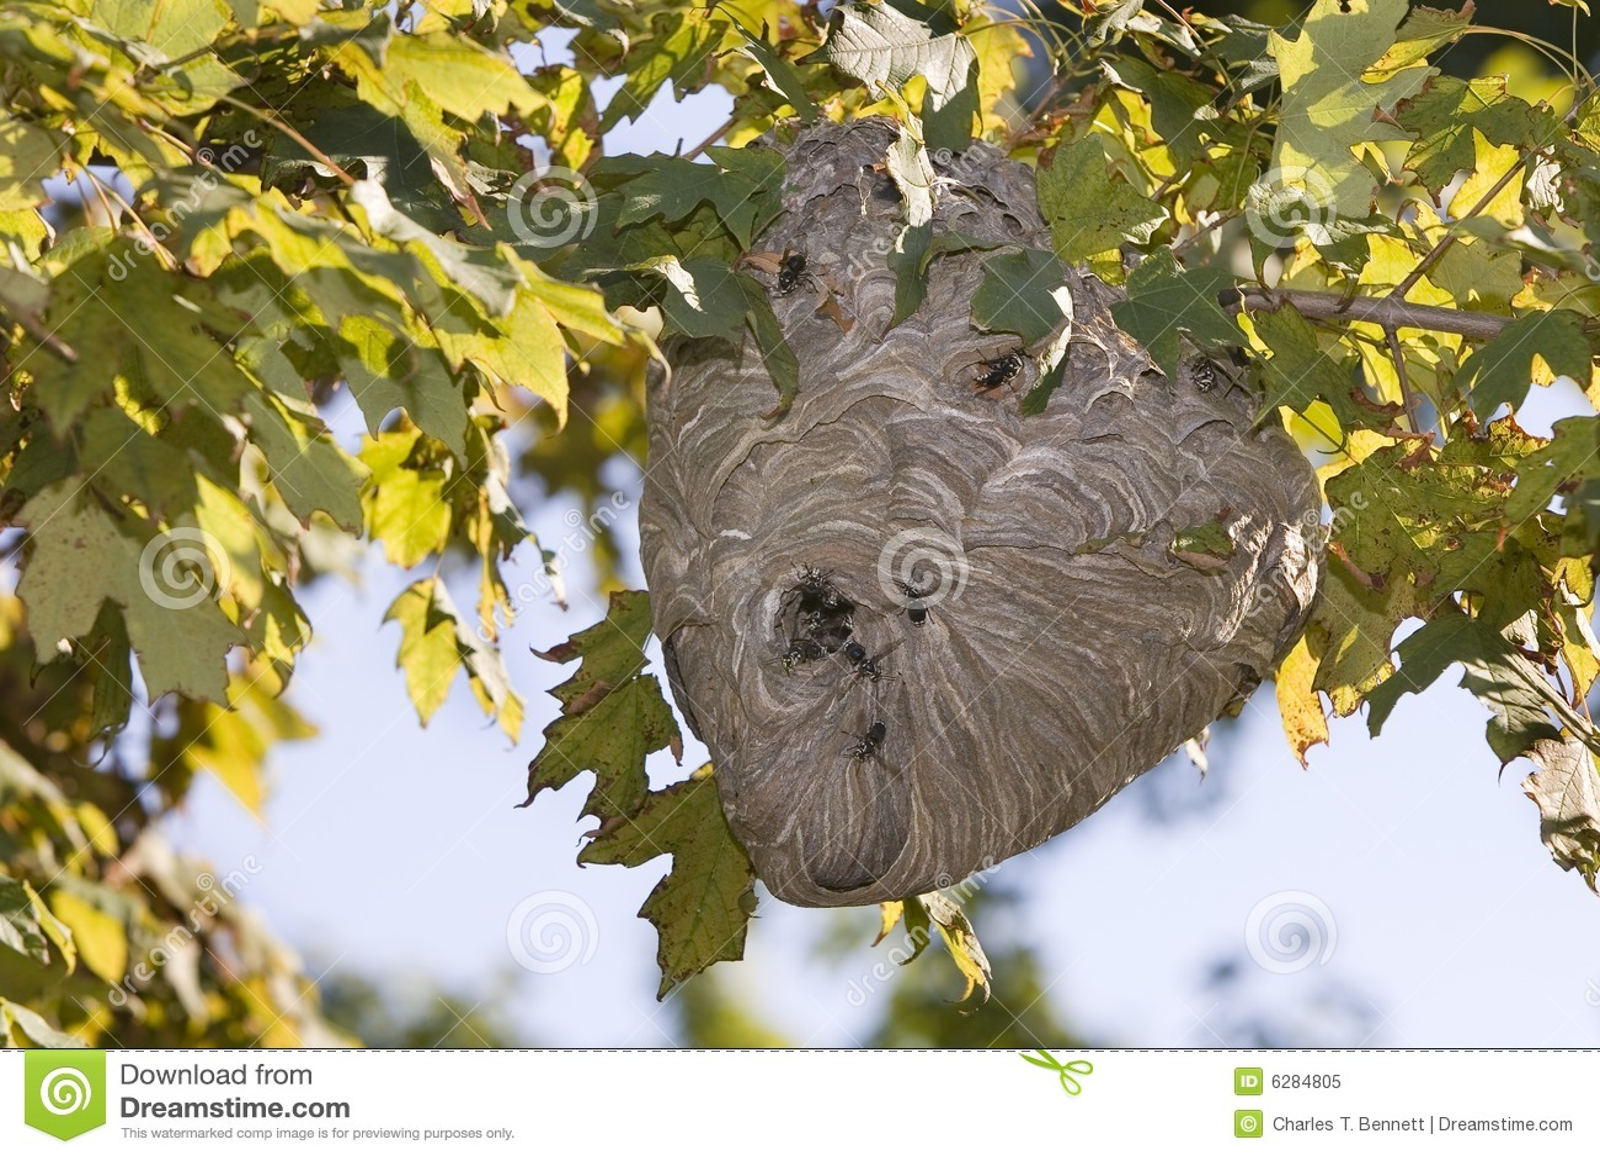 Active Hornet s Nest With Hornets